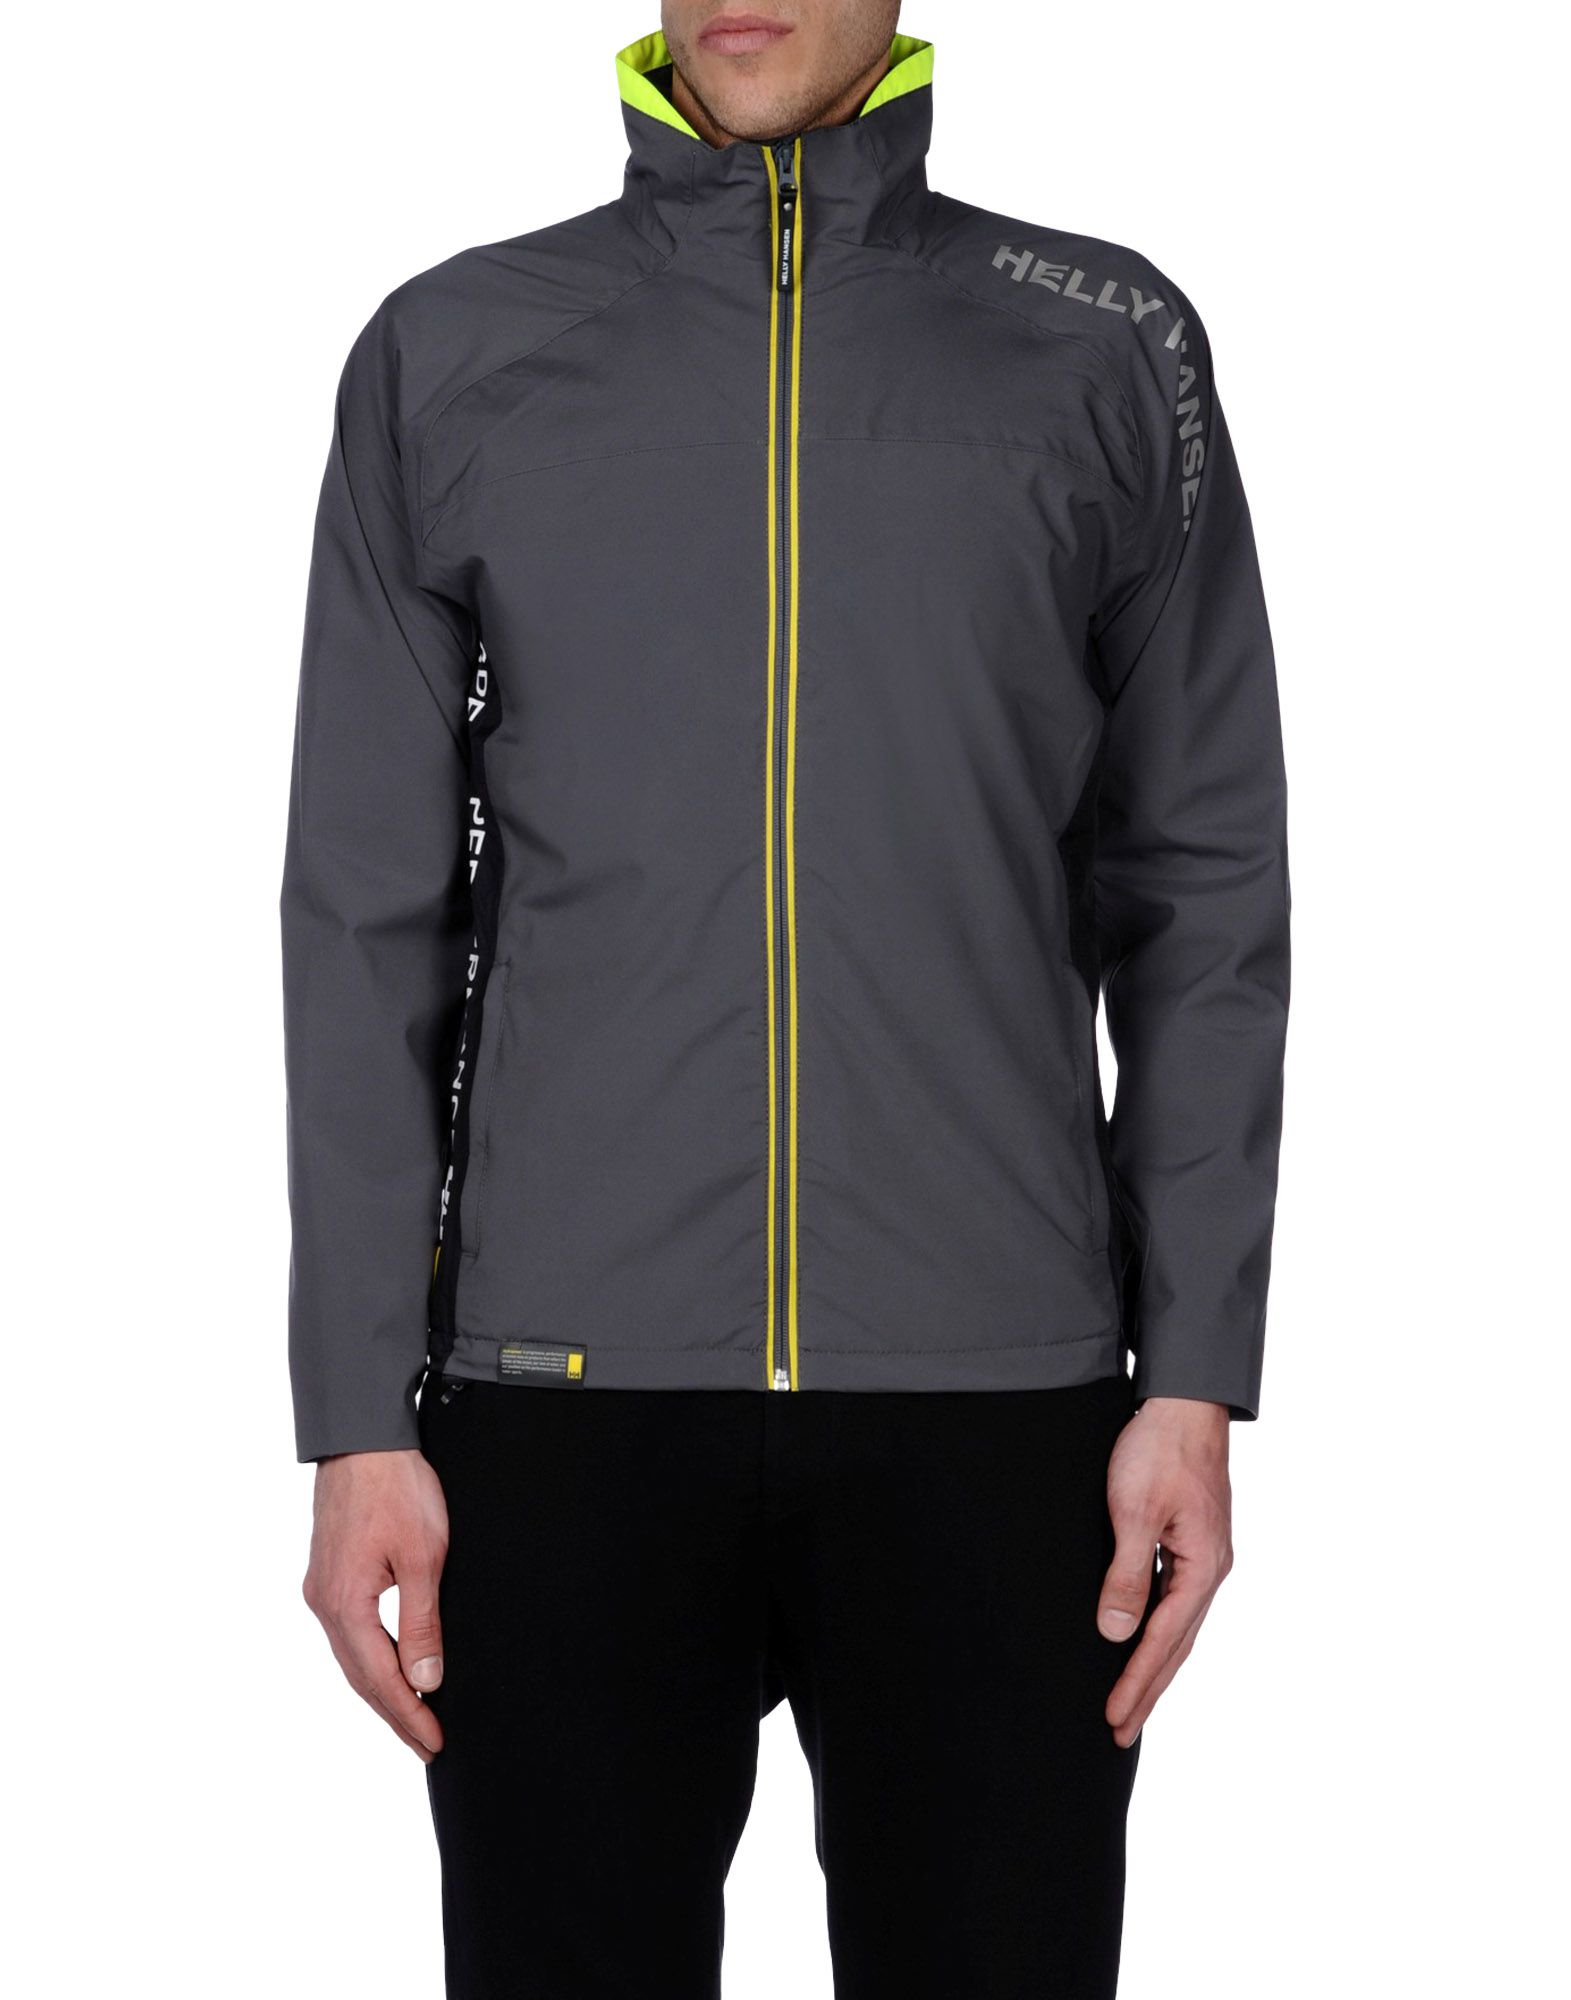 Helly Hansen Jacket in Grey (Gray) for Men - Lyst